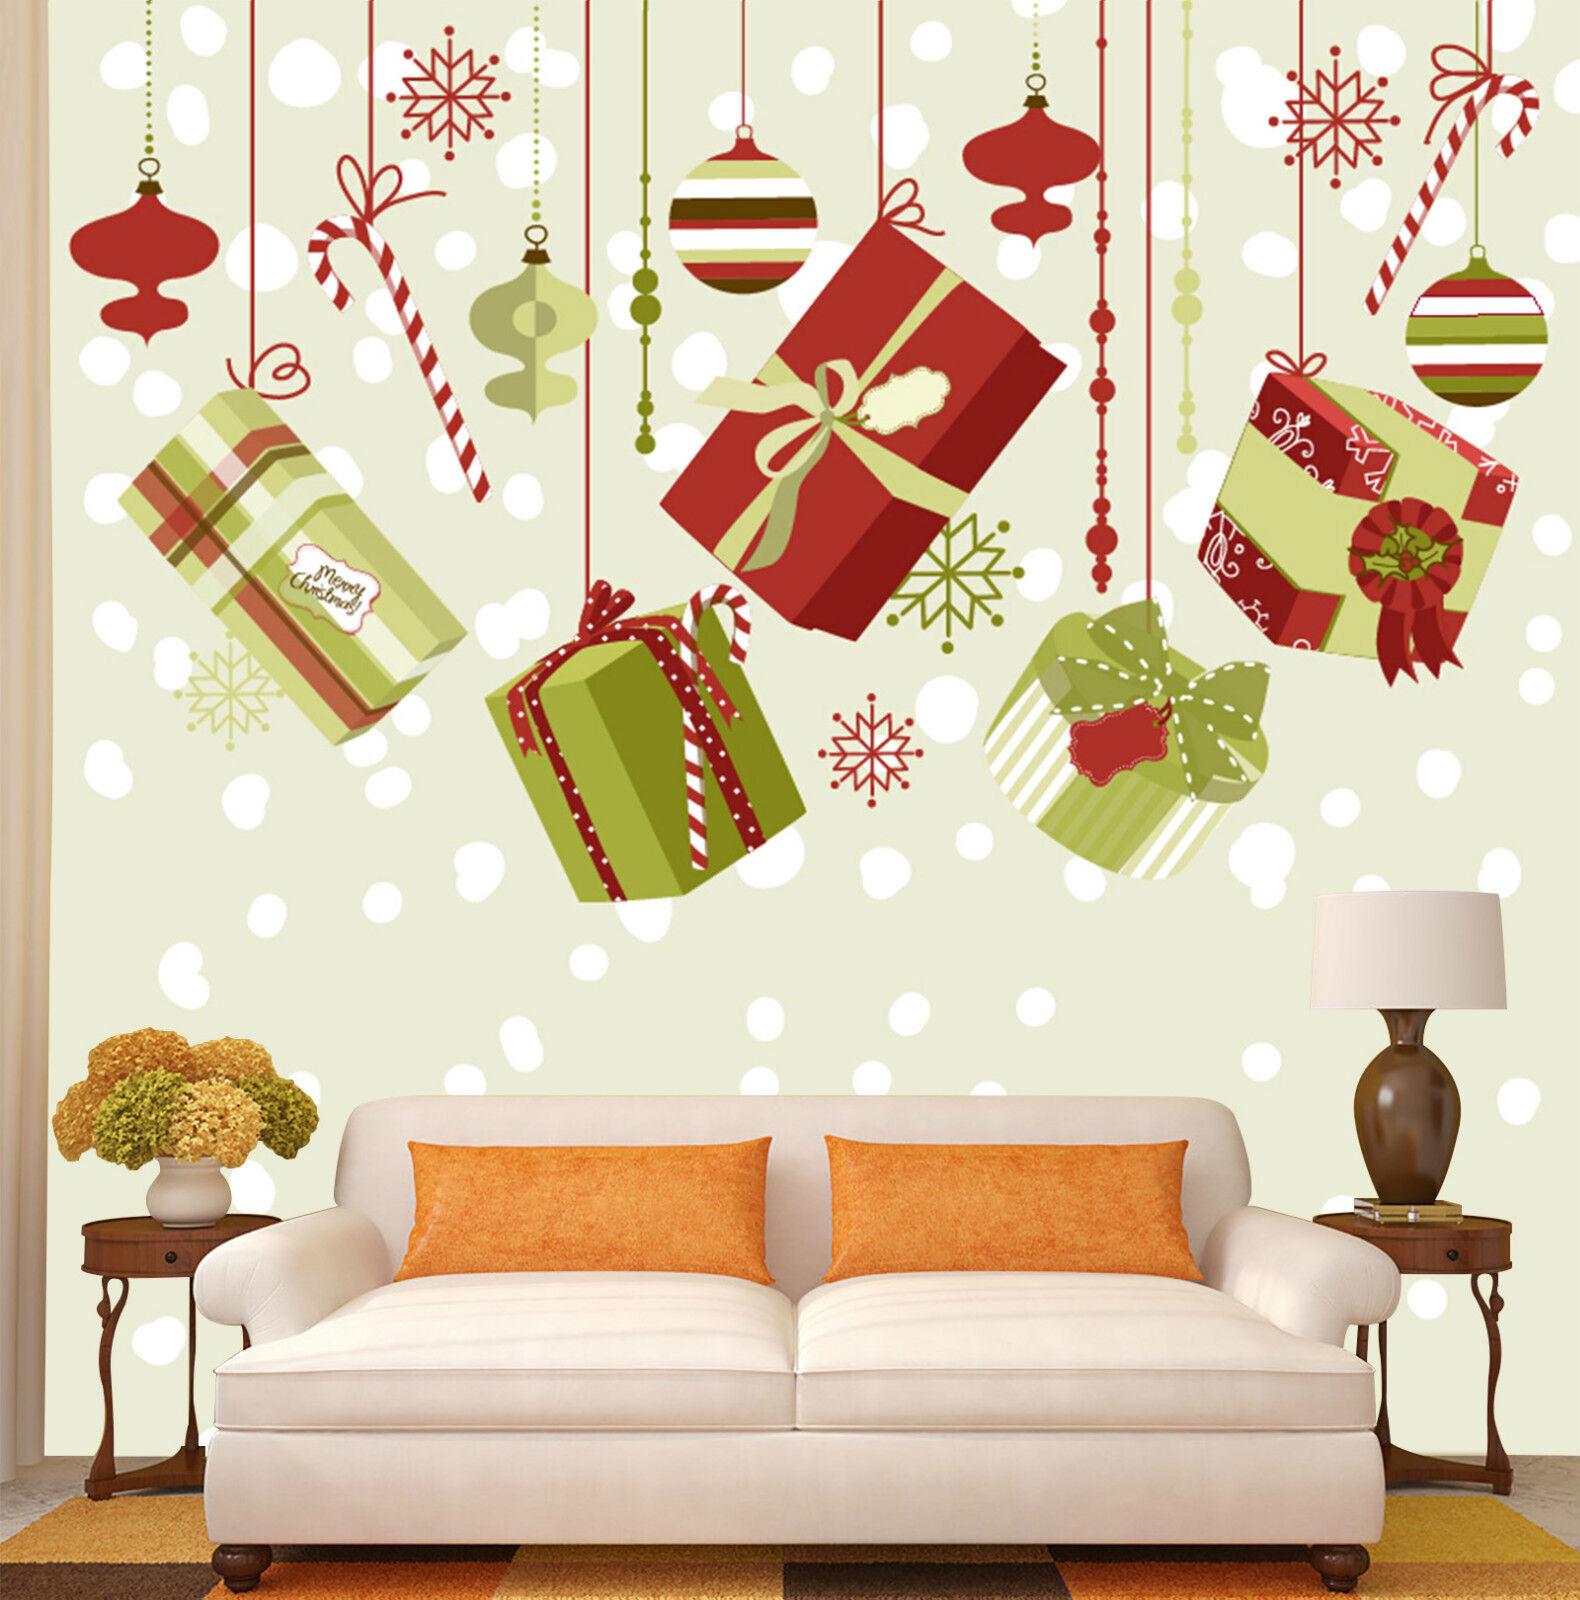 3D Weihnachten Hängende Geschenk Fototapeten Wandbild Bild Tapete Familie Kinder